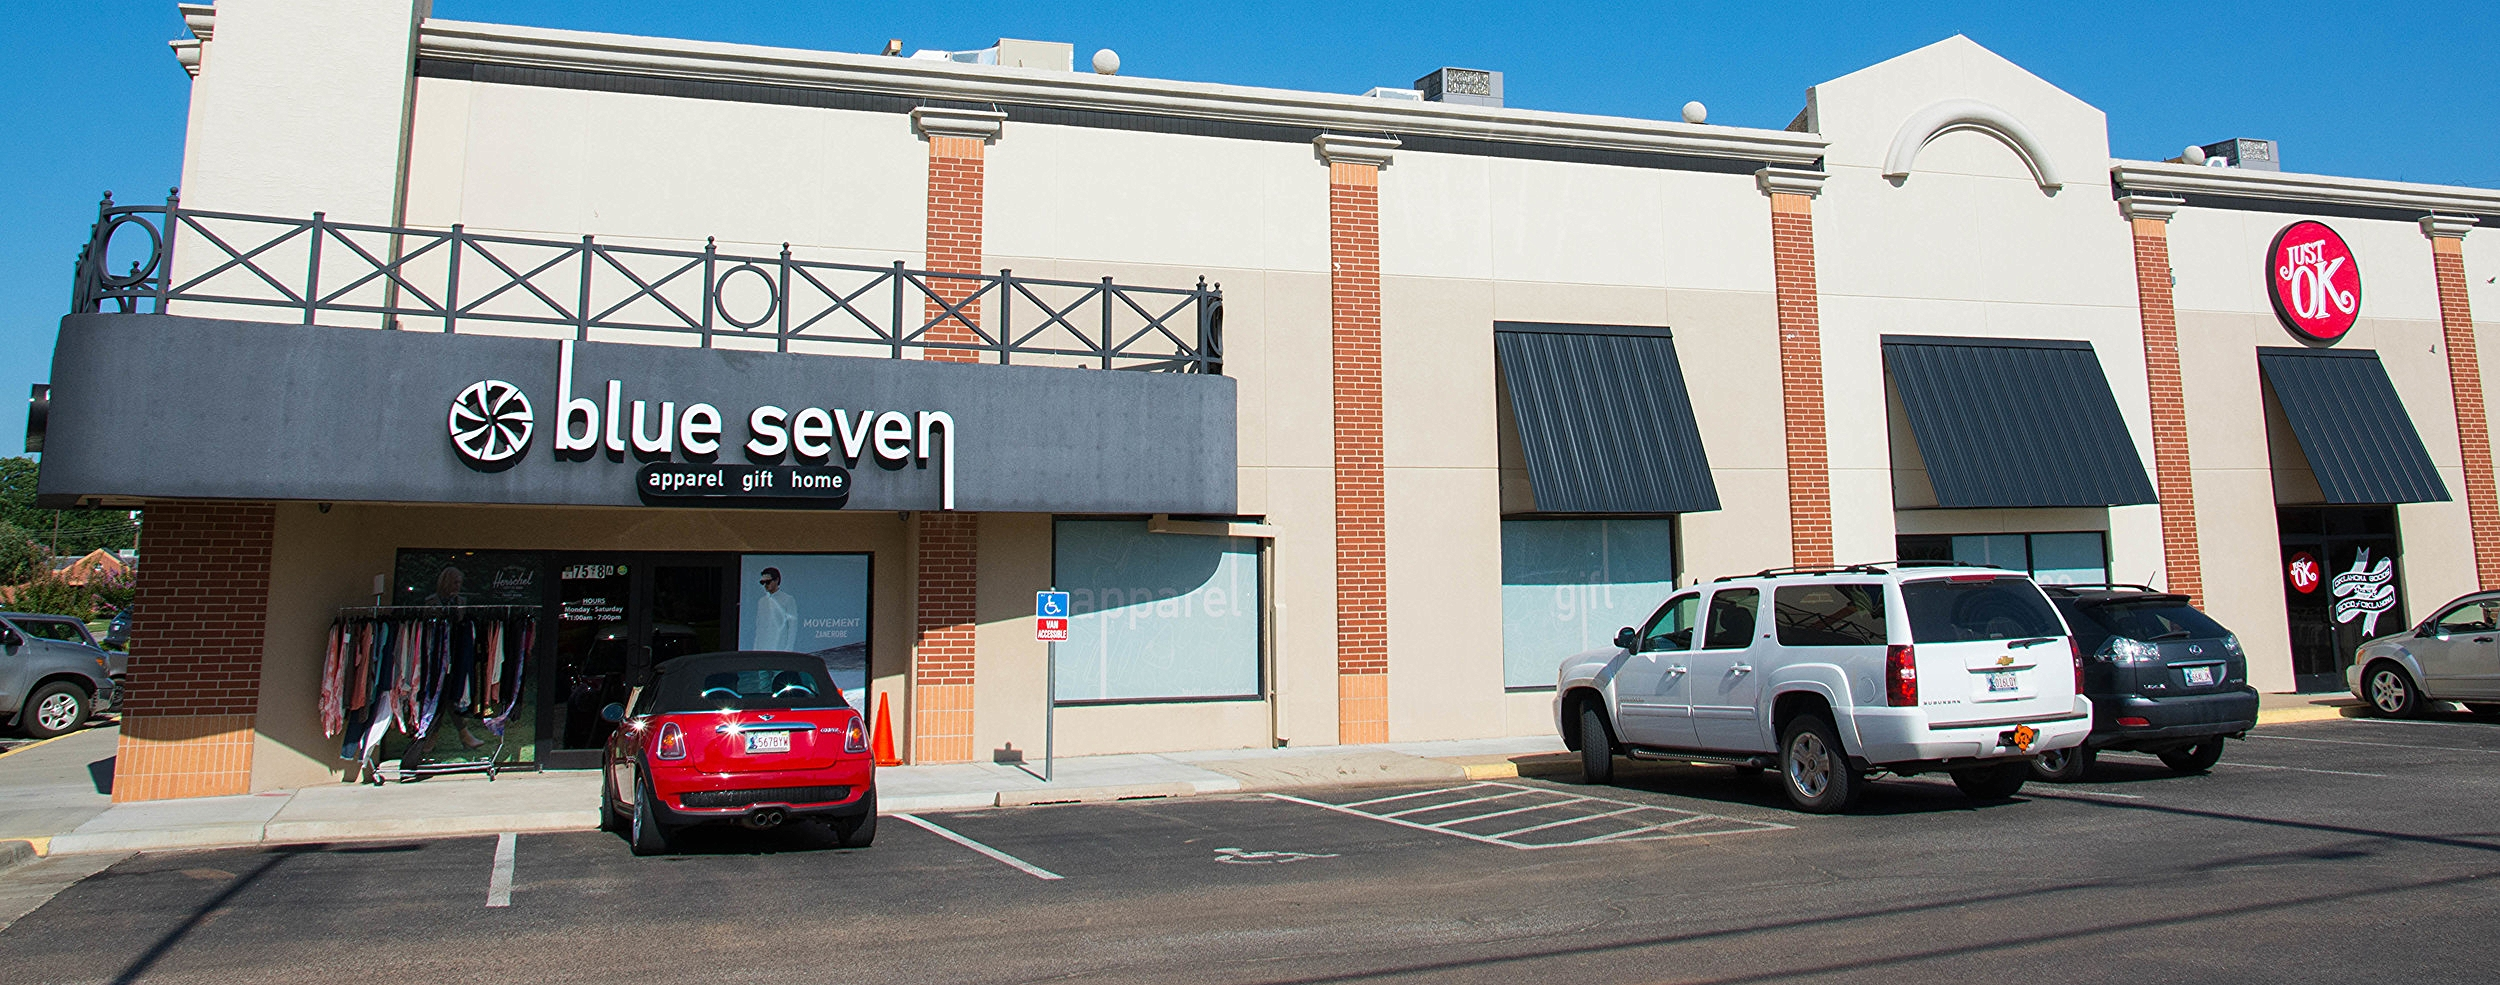 Blue Seven in Oklahoma City.